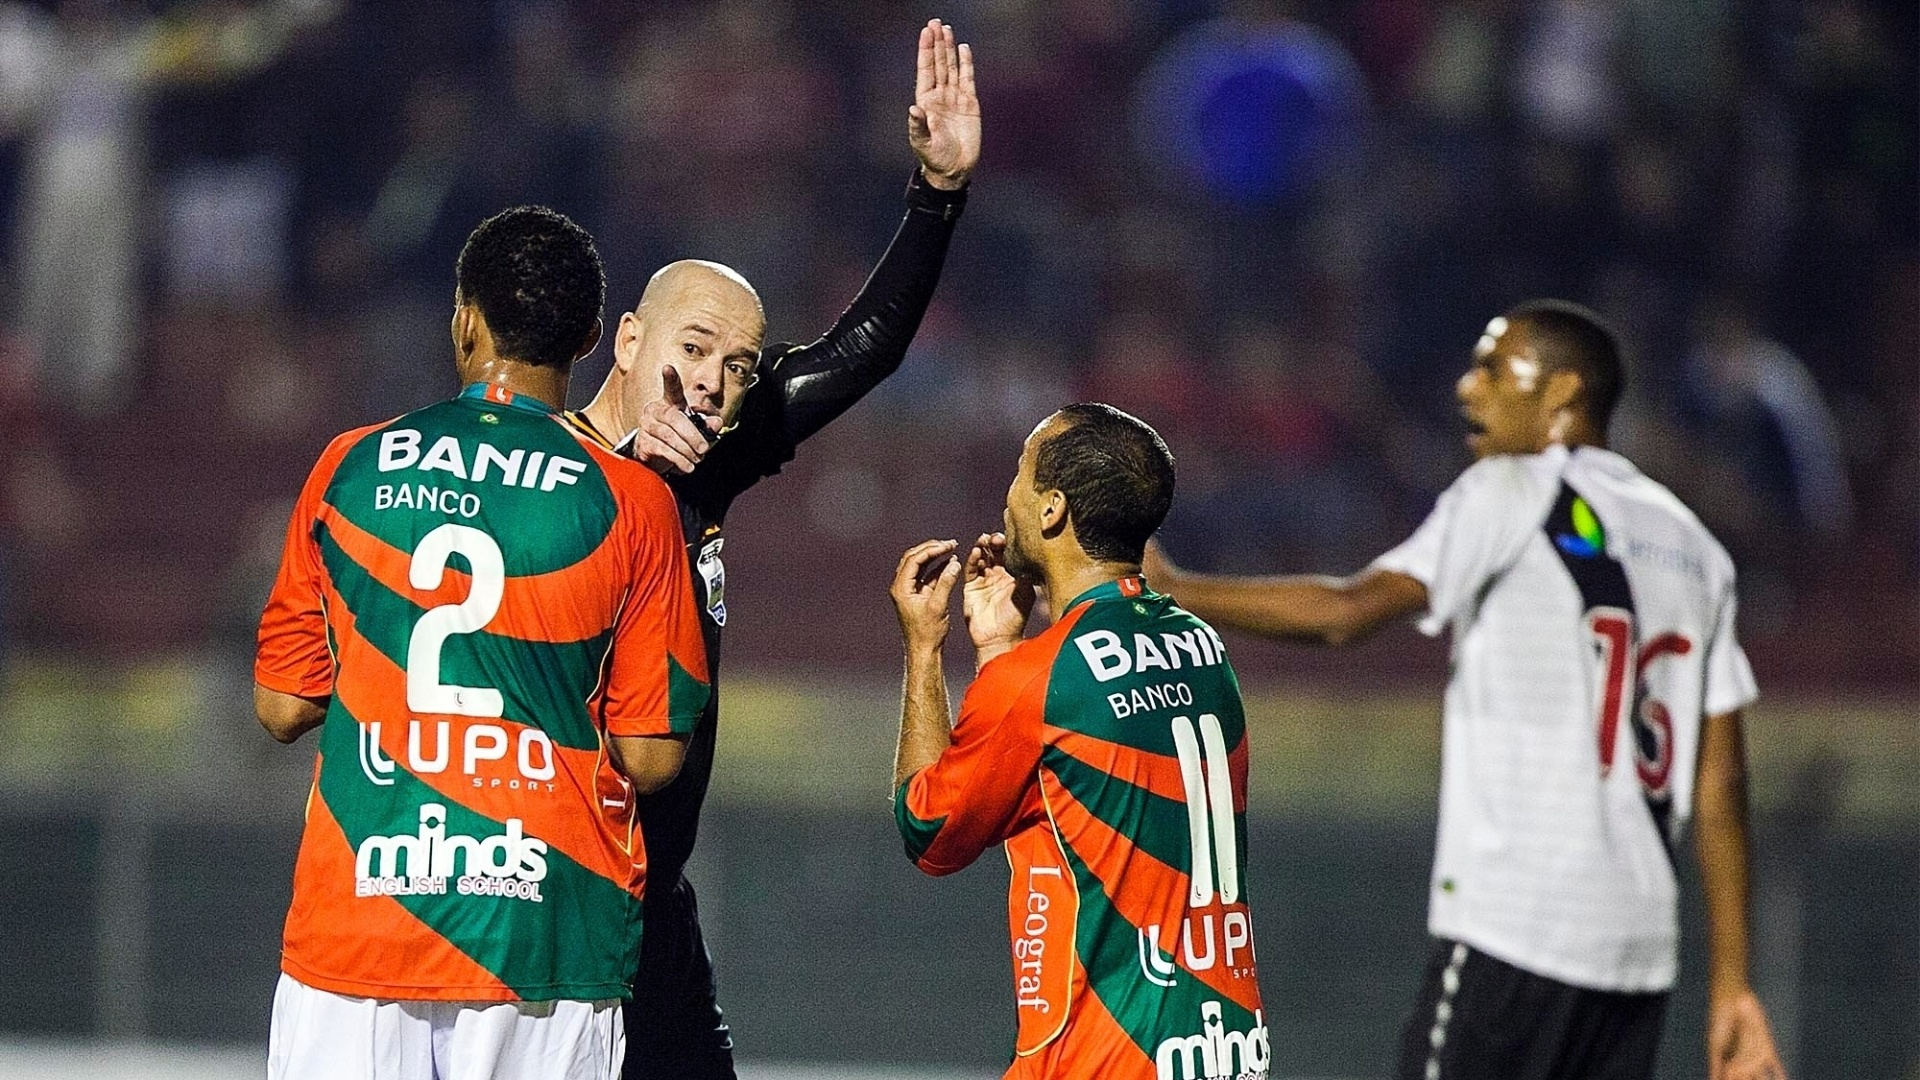 Luis Ricardo e Ananias reclamam com o árbitro, Héber Roberto Lopes, sobre o tempo de acréscimo